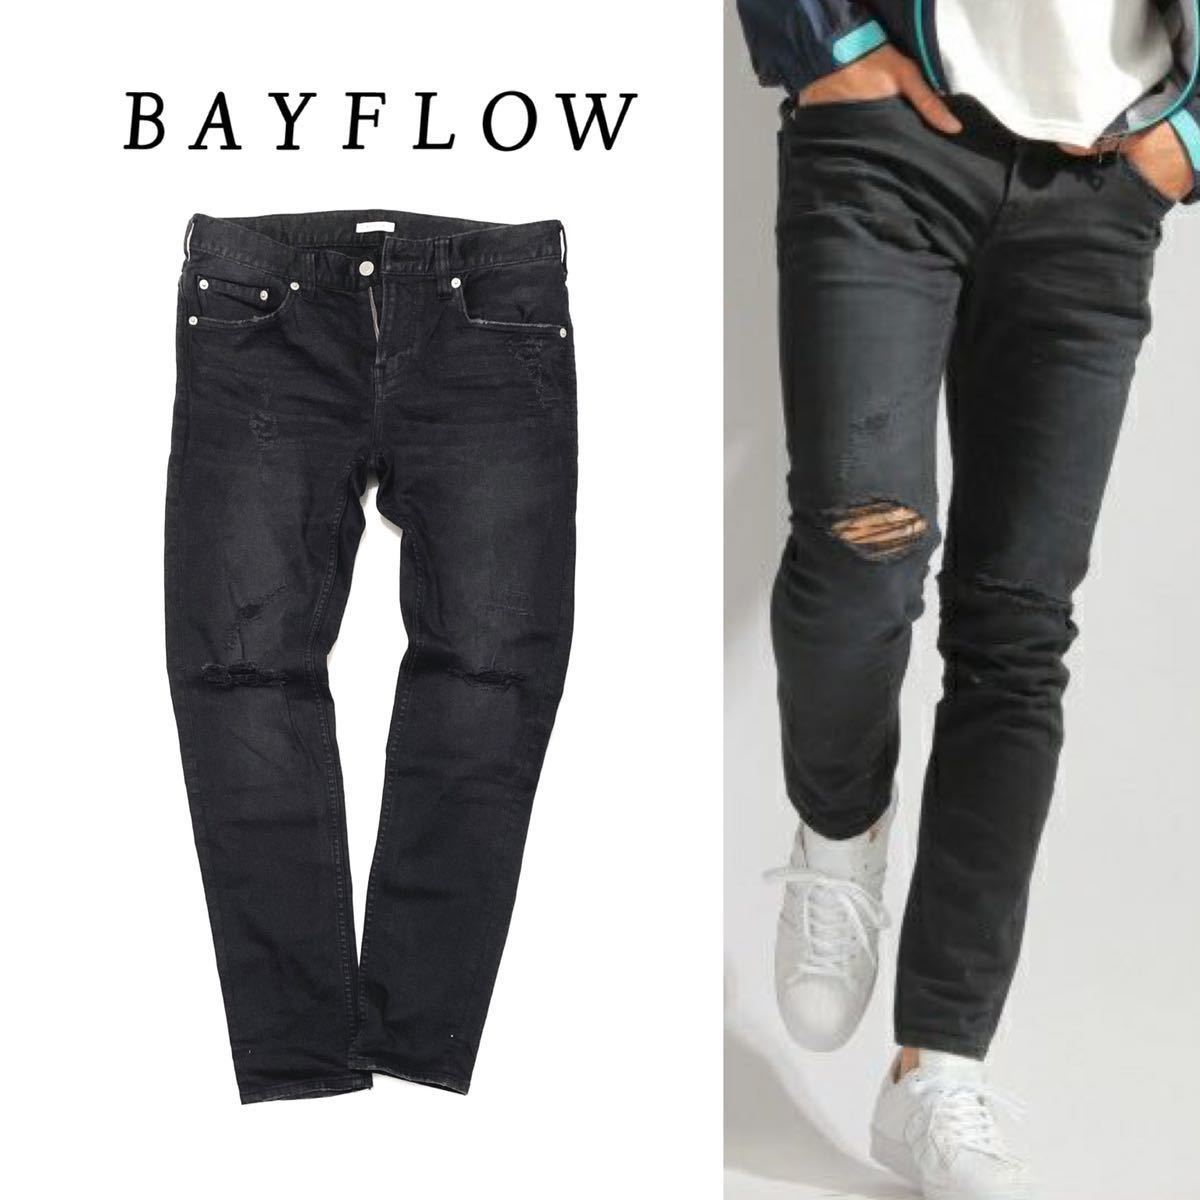 【BAYFLOW】男らしいタフ感デニム◎!!!ベイフロー ブラックデニム クラッシュ加工 テーパ